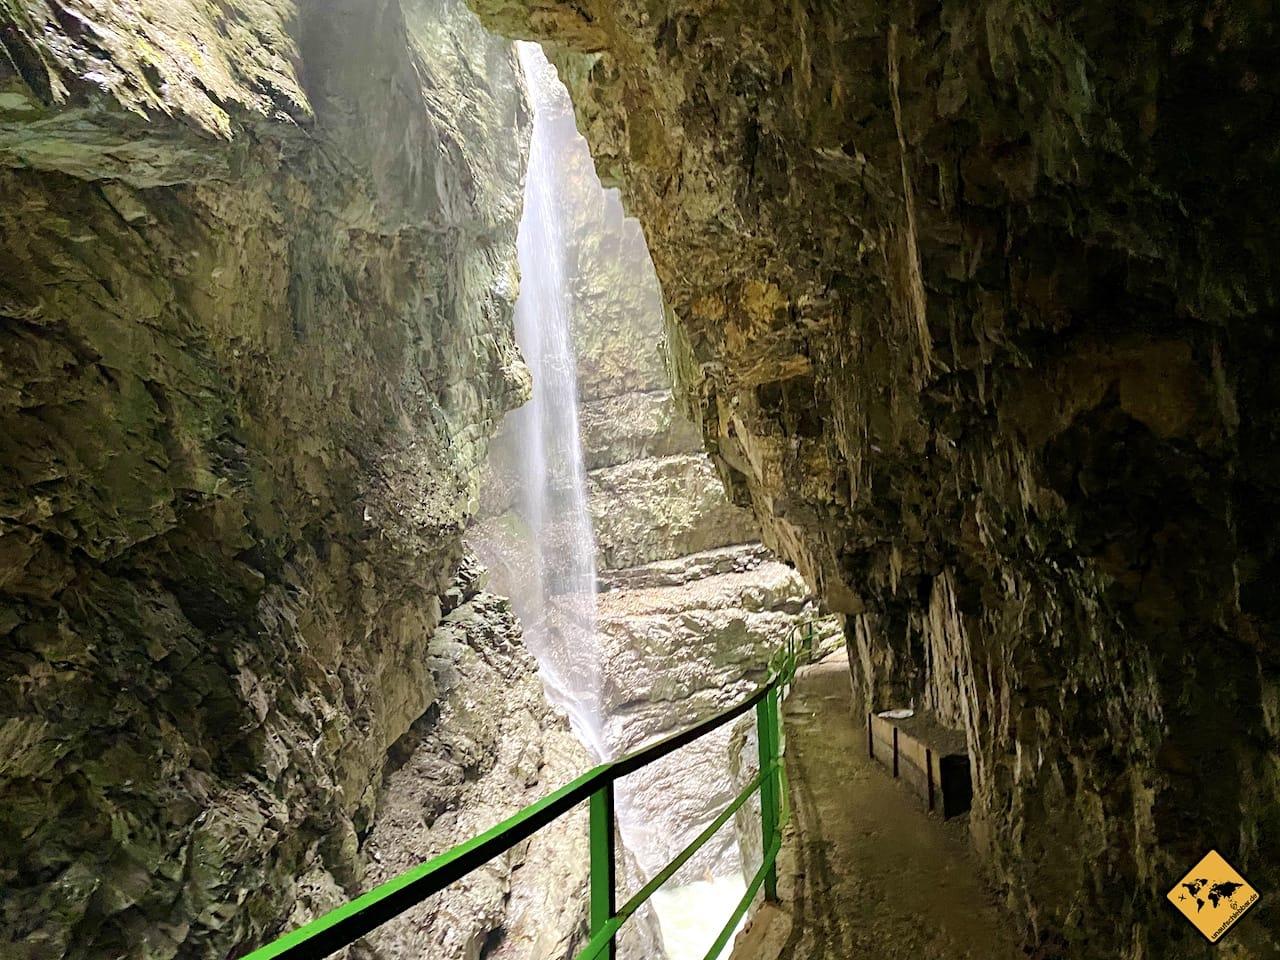 Großer Wasserfall Breitachklamm